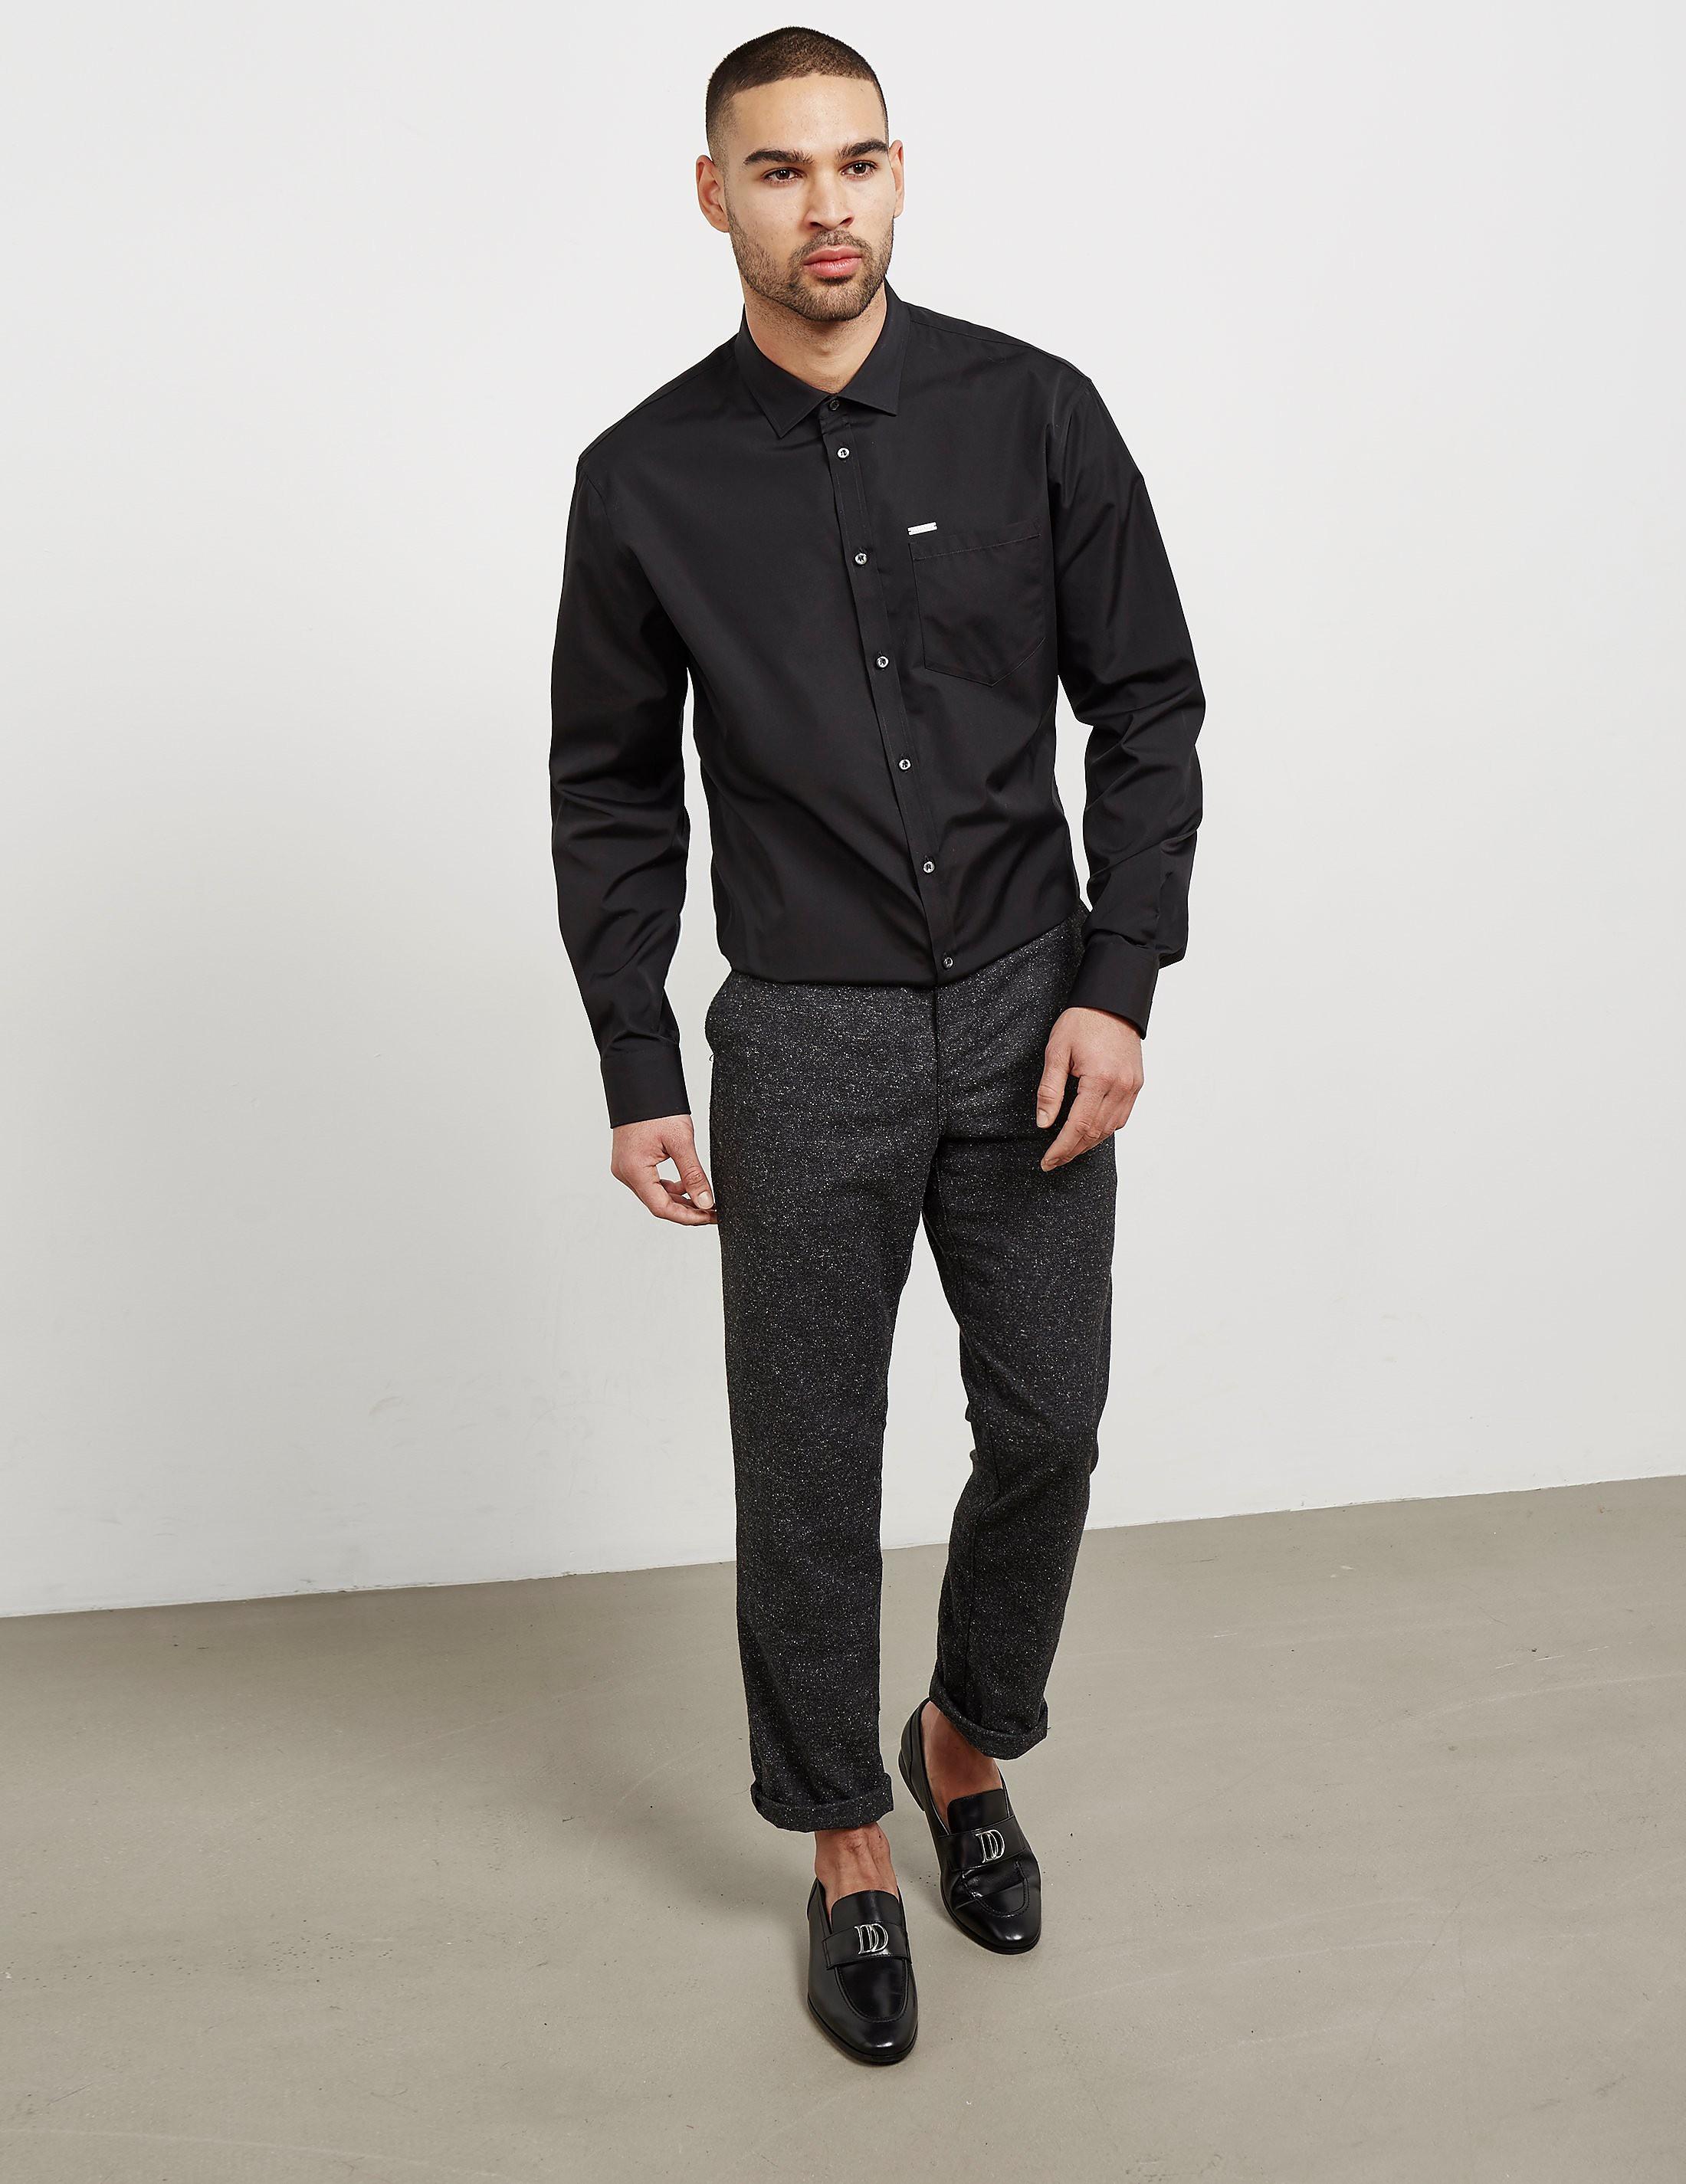 Dsquared2 Pocket Bar Long Sleeve Shirt